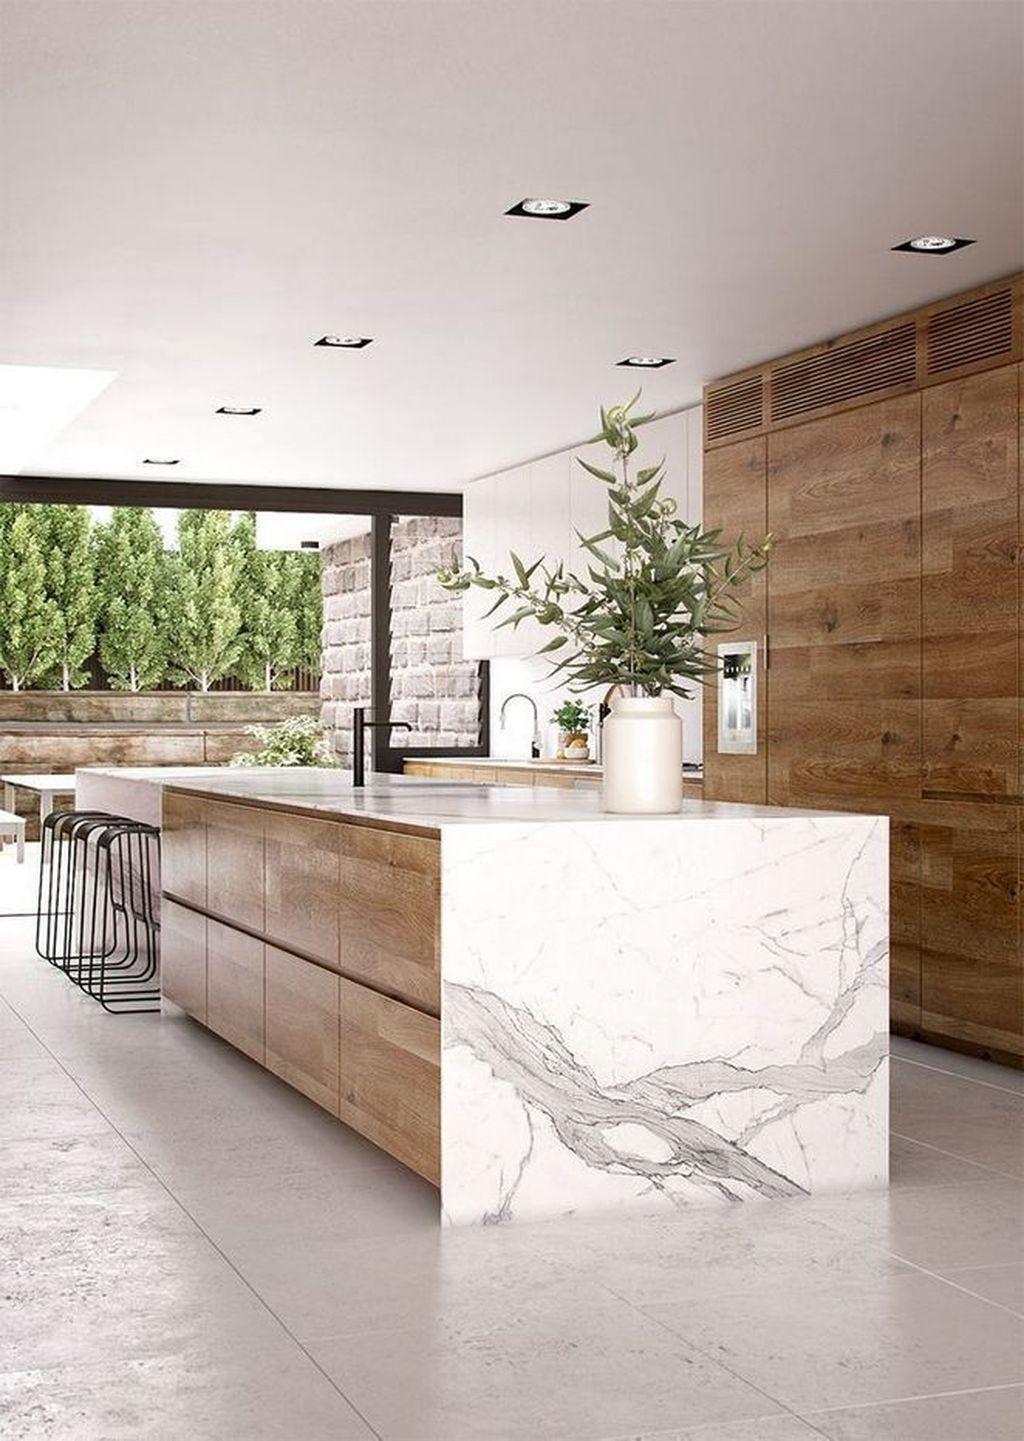 21 Modern Kitchen Concepts Every Home Prepare Requirements to See  #kitchenaid#kitchenrugs#kitchendecor#kitchenfaucetslowes#kitchenflooring #kitchendesignideas